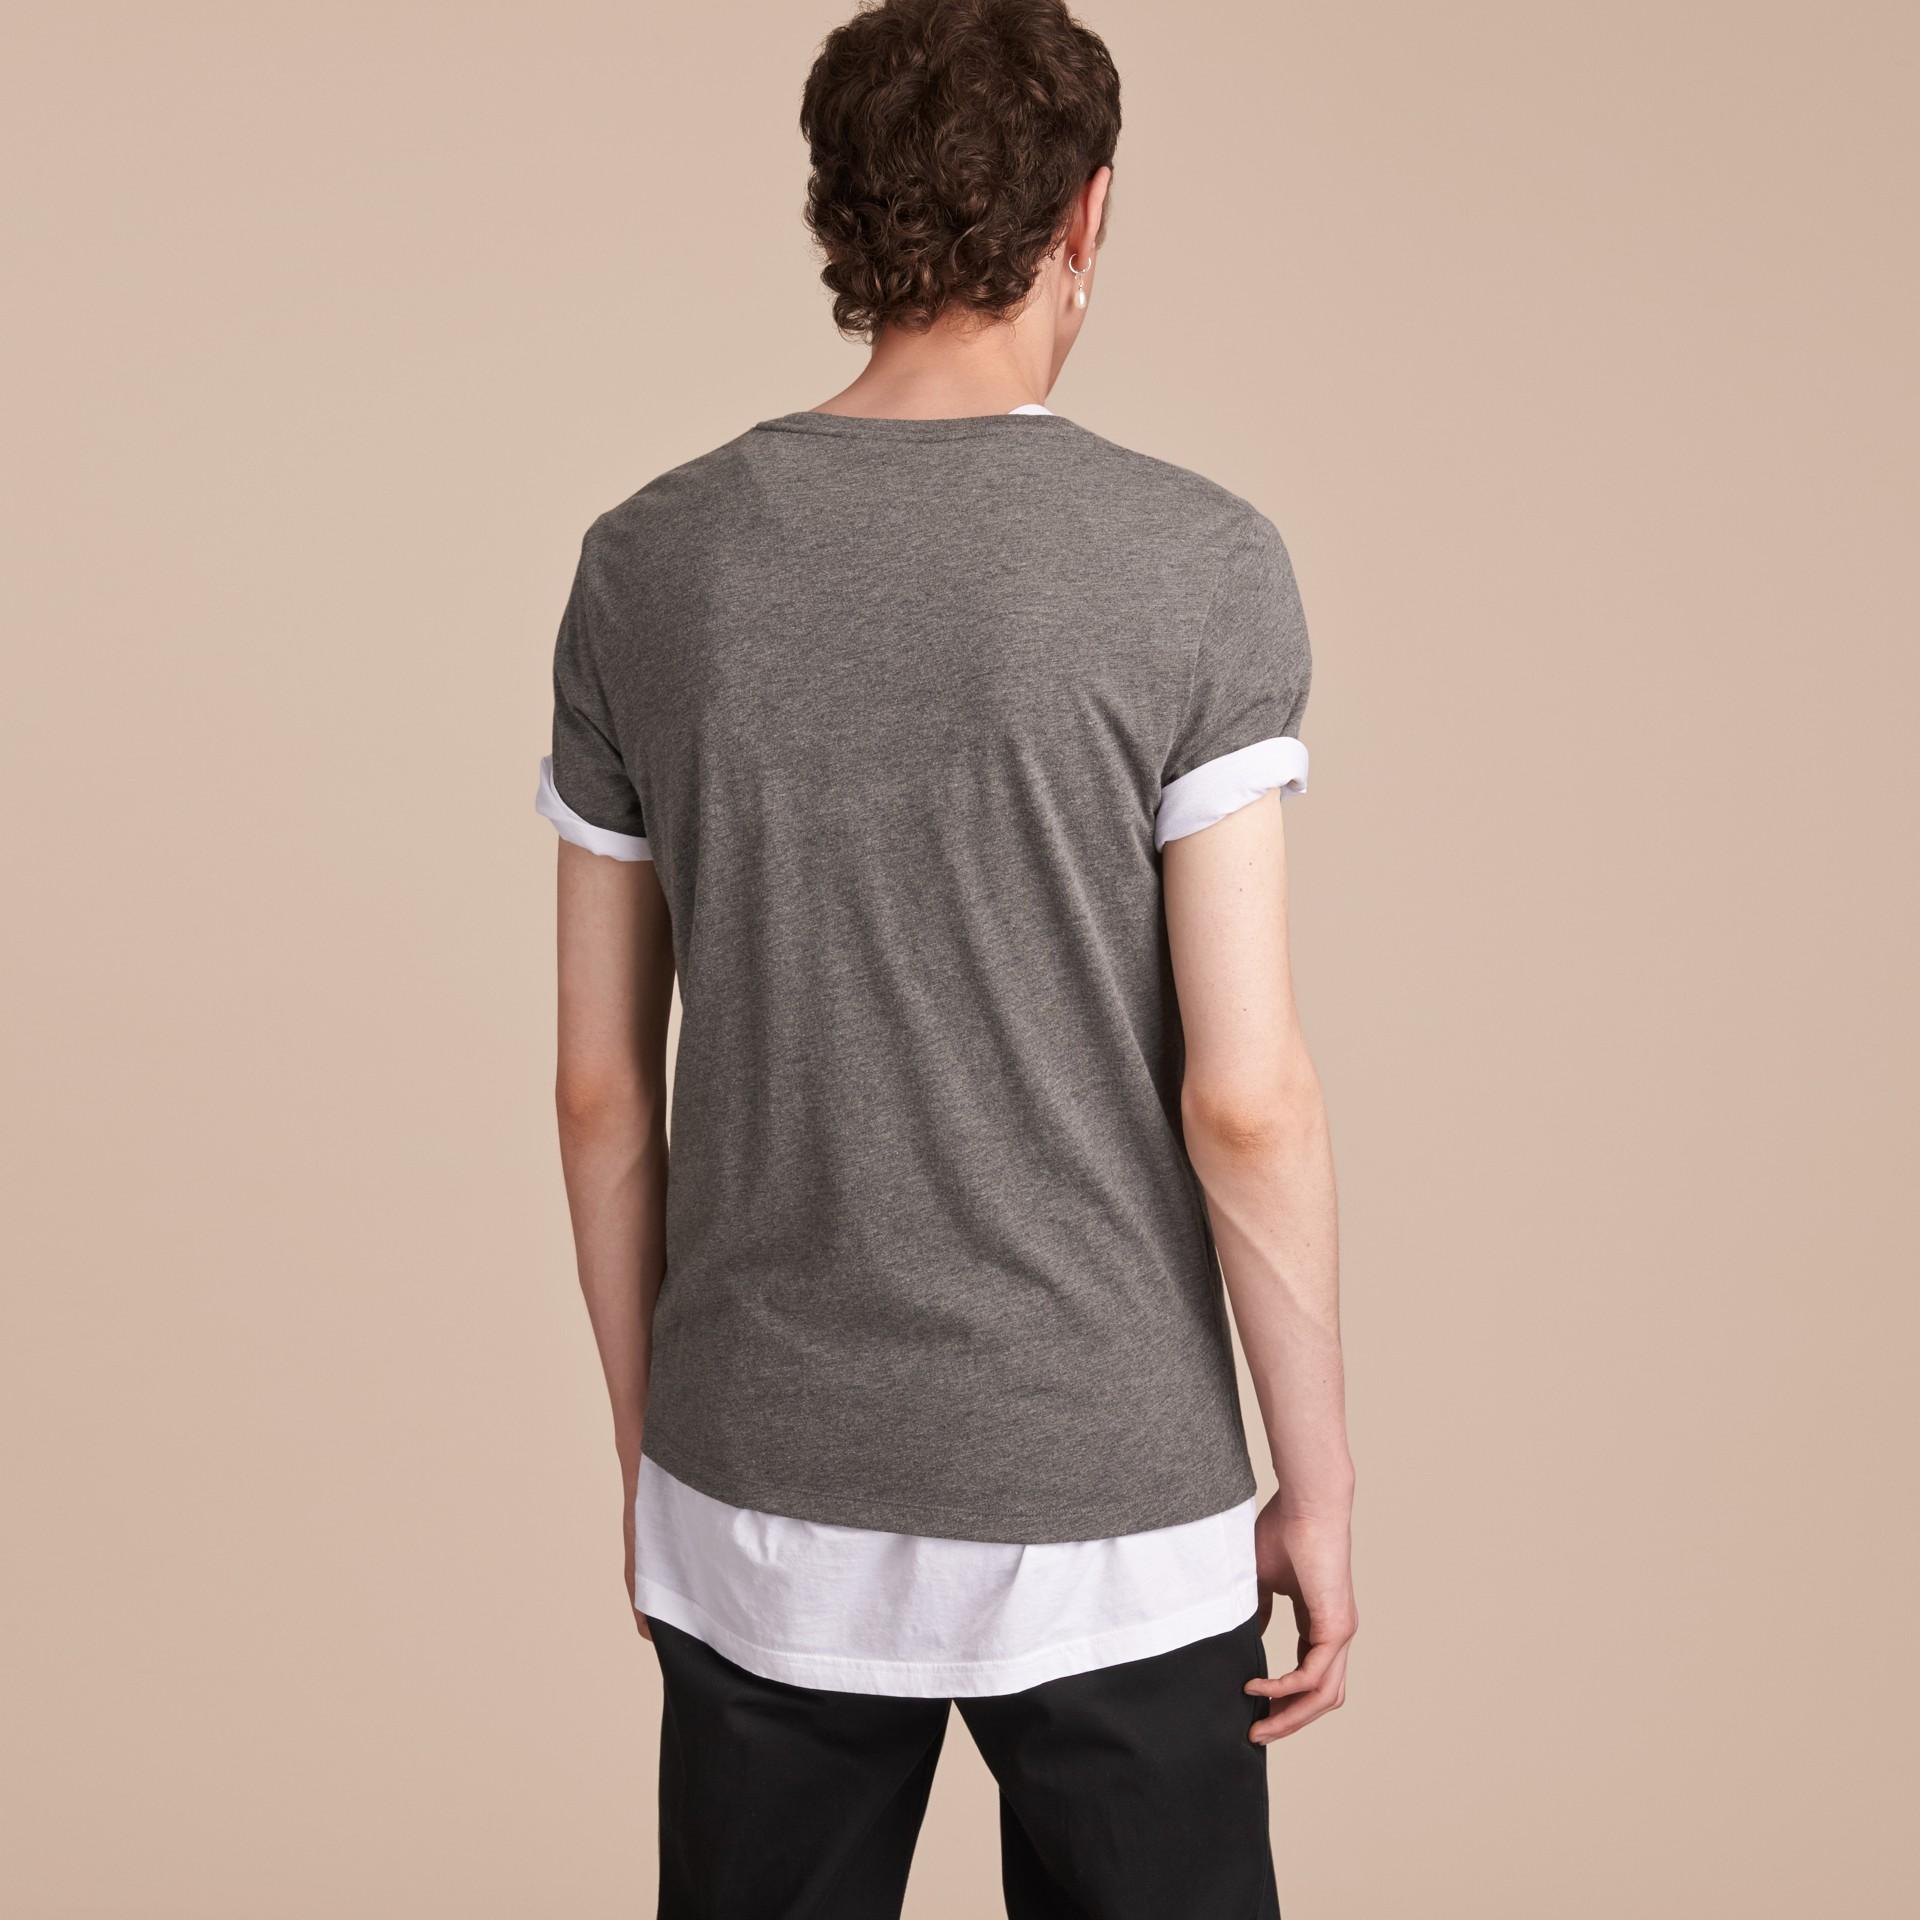 Contrast Motif Cotton Blend T-shirt Mid Grey Melange - gallery image 3